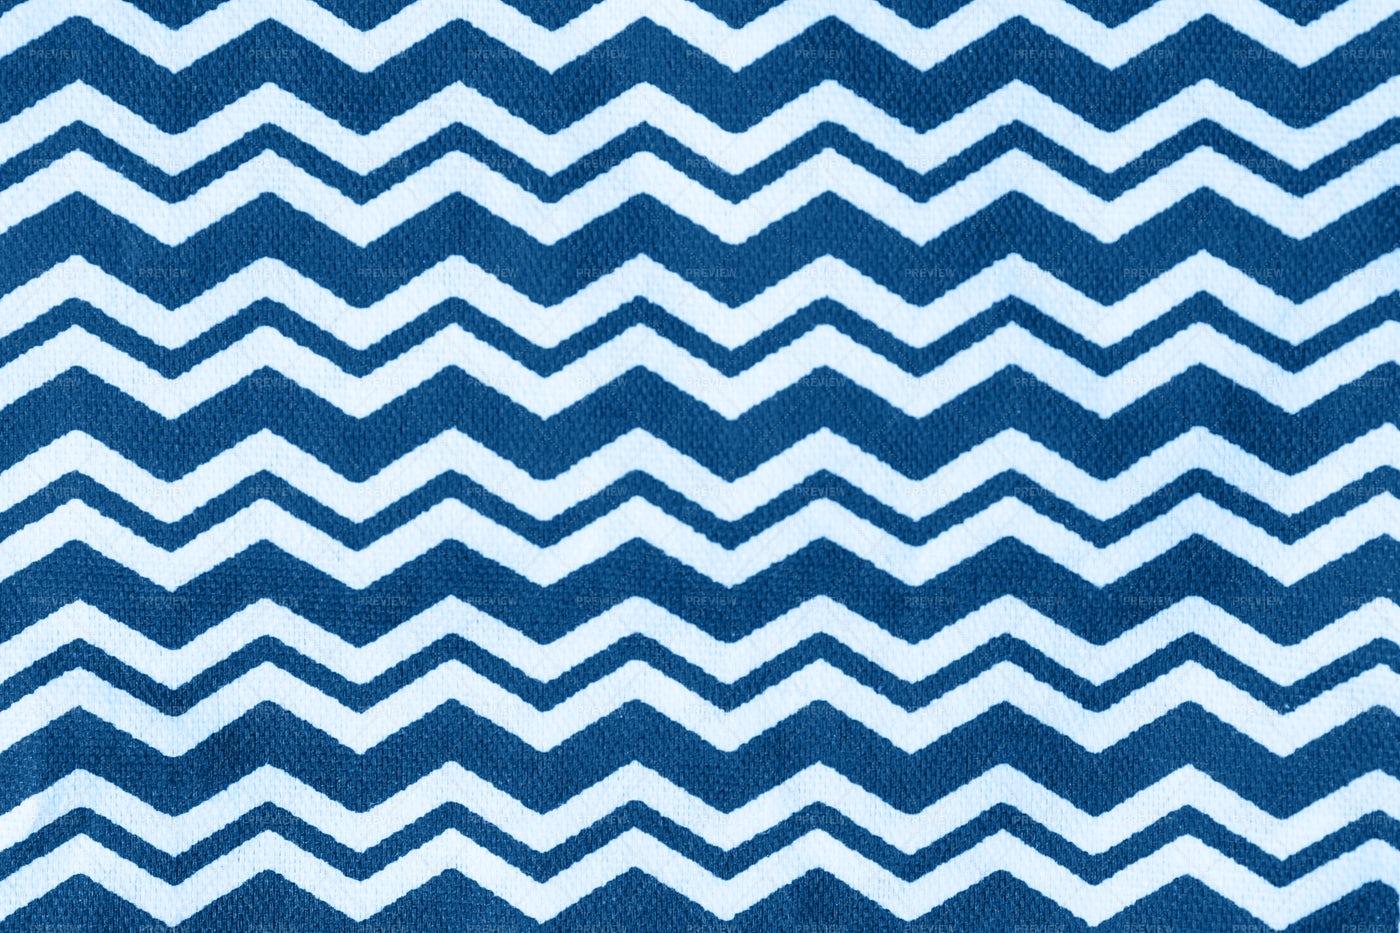 Blue Geometric Wave Background: Stock Photos